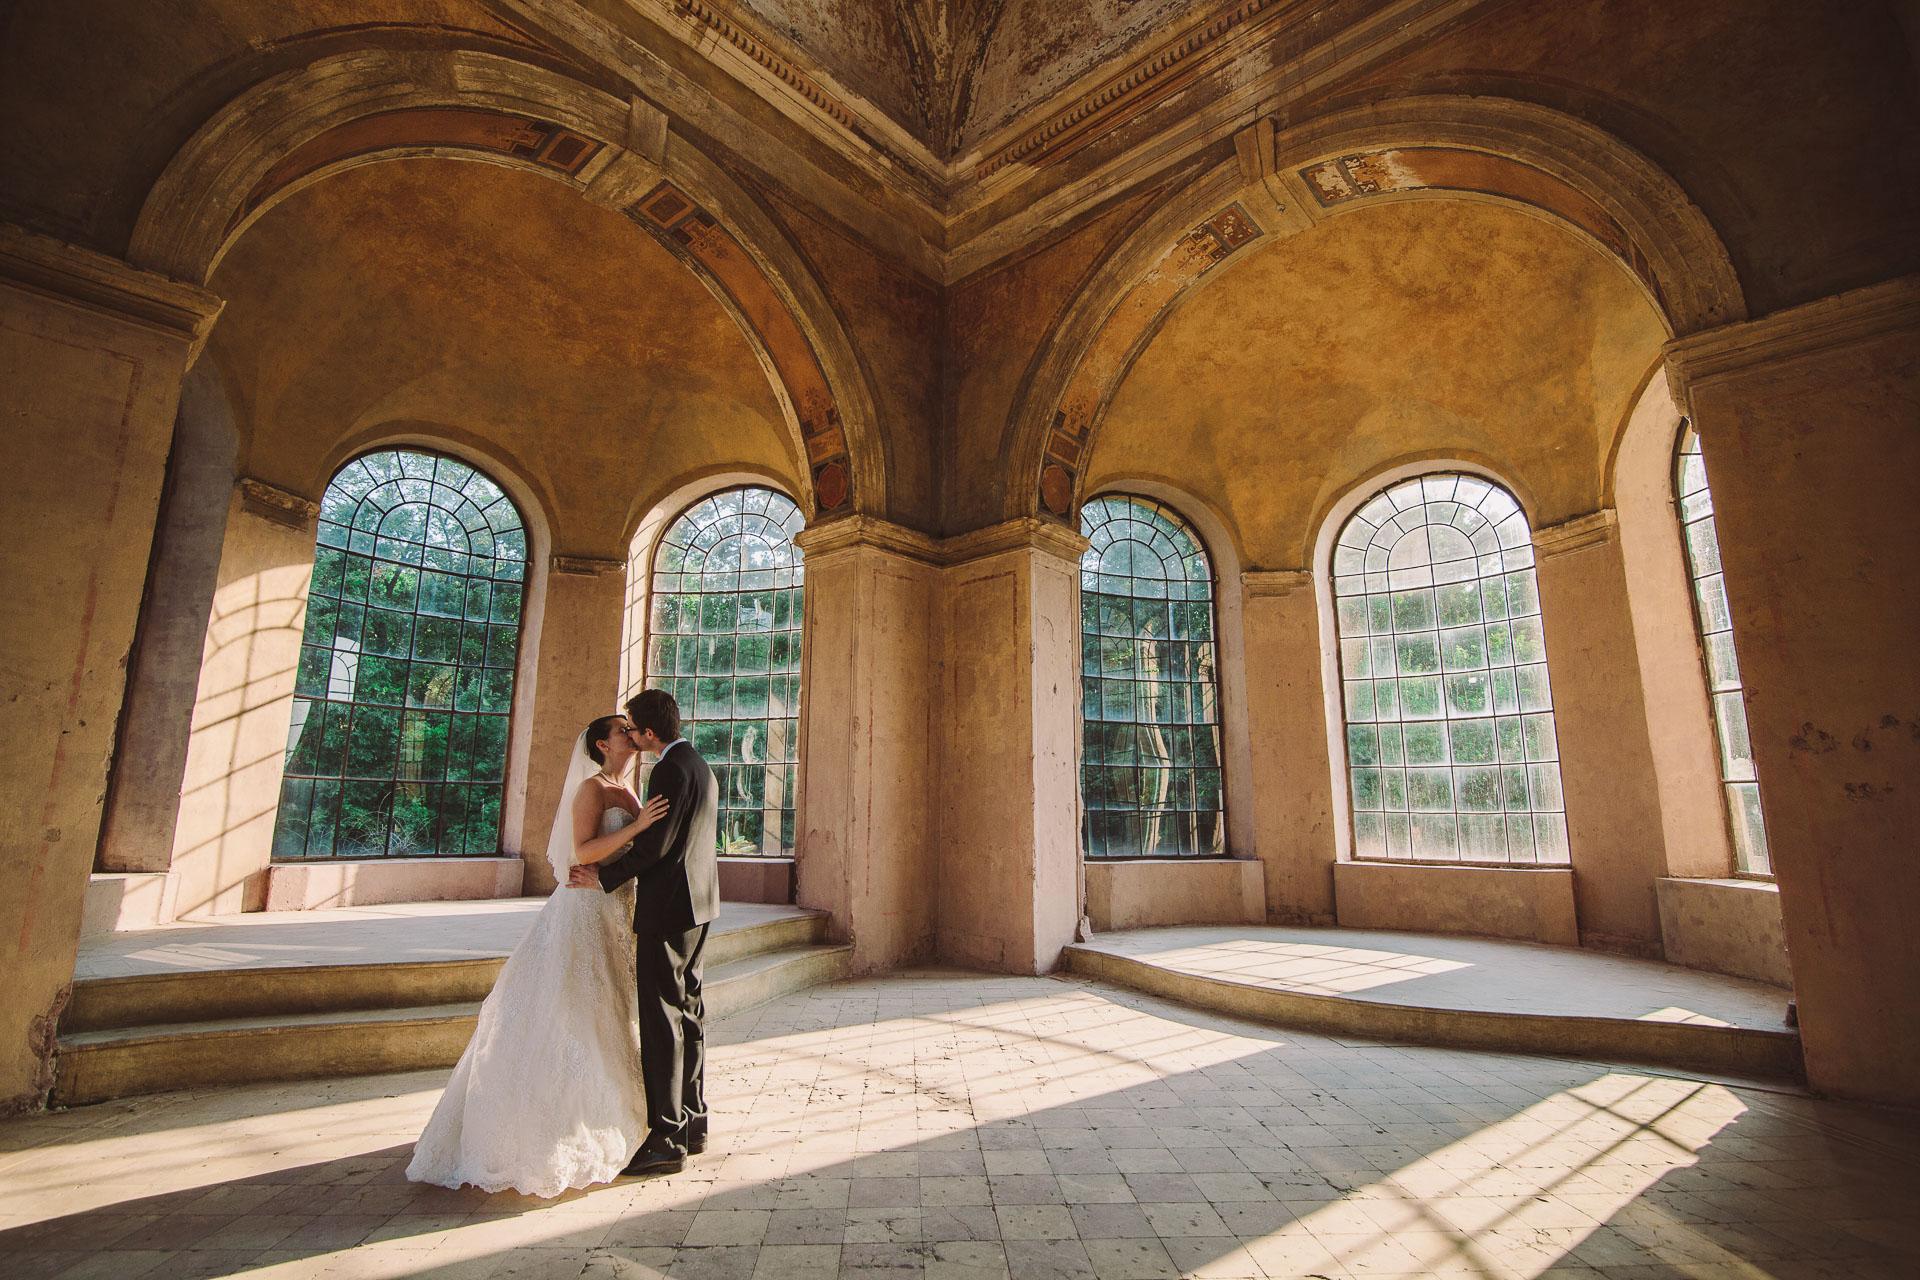 eskuvo_fotozas_wedding_foto_lenart_gabor_sztyui_budapest_IMG_9203